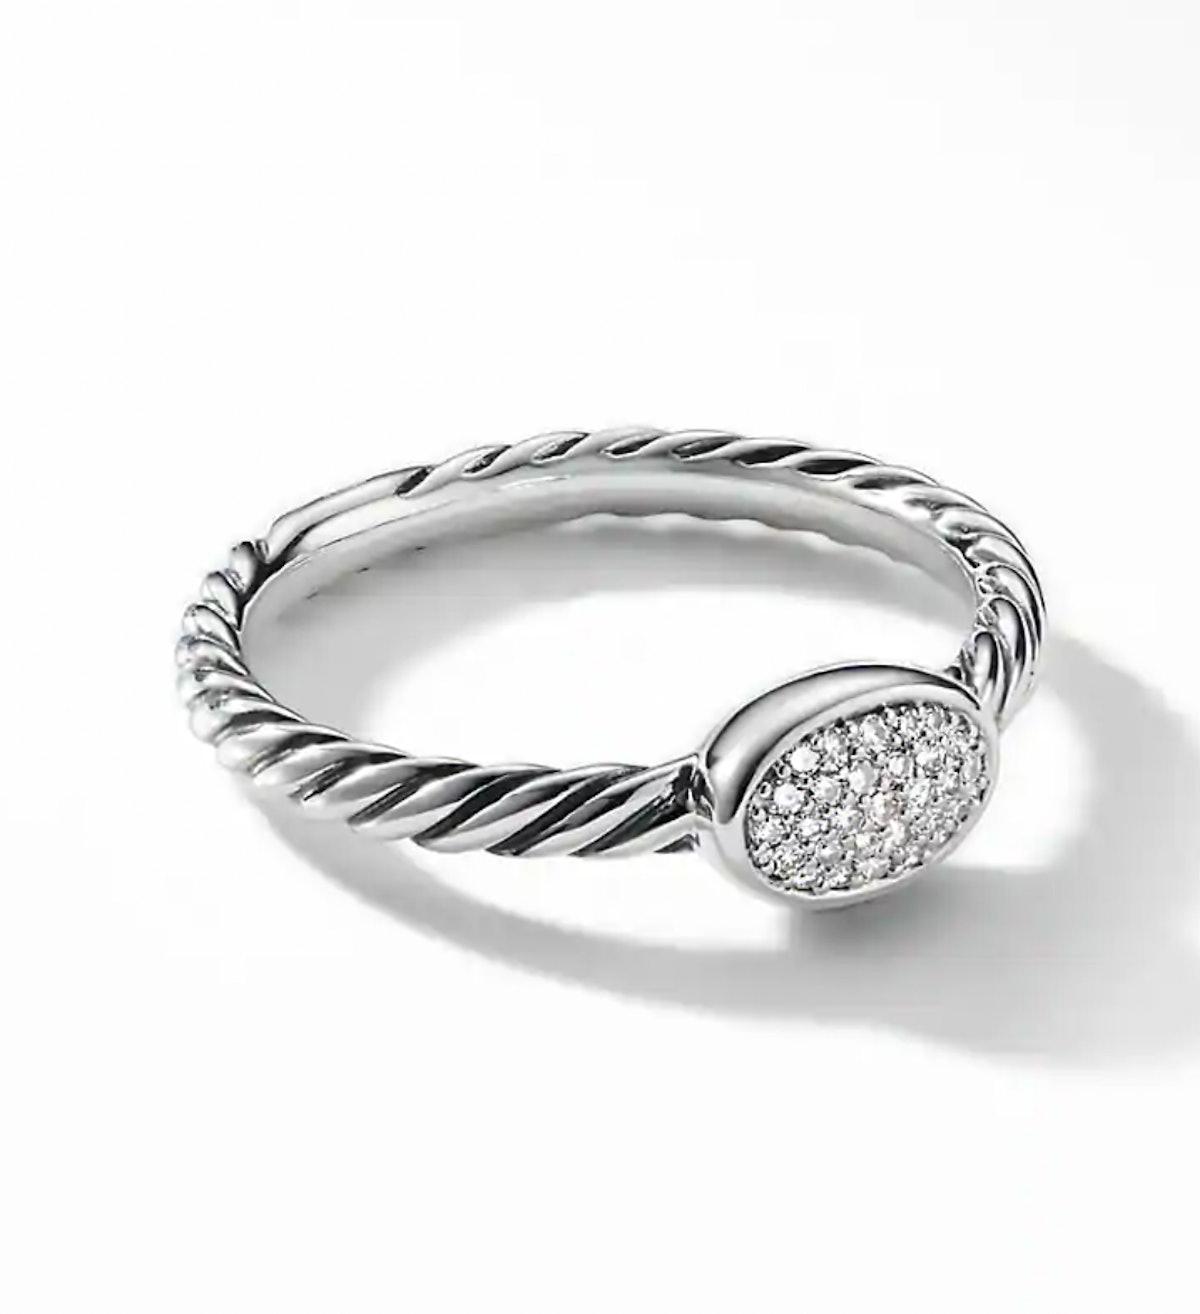 Petite Pave Oval Ring with Diamonds